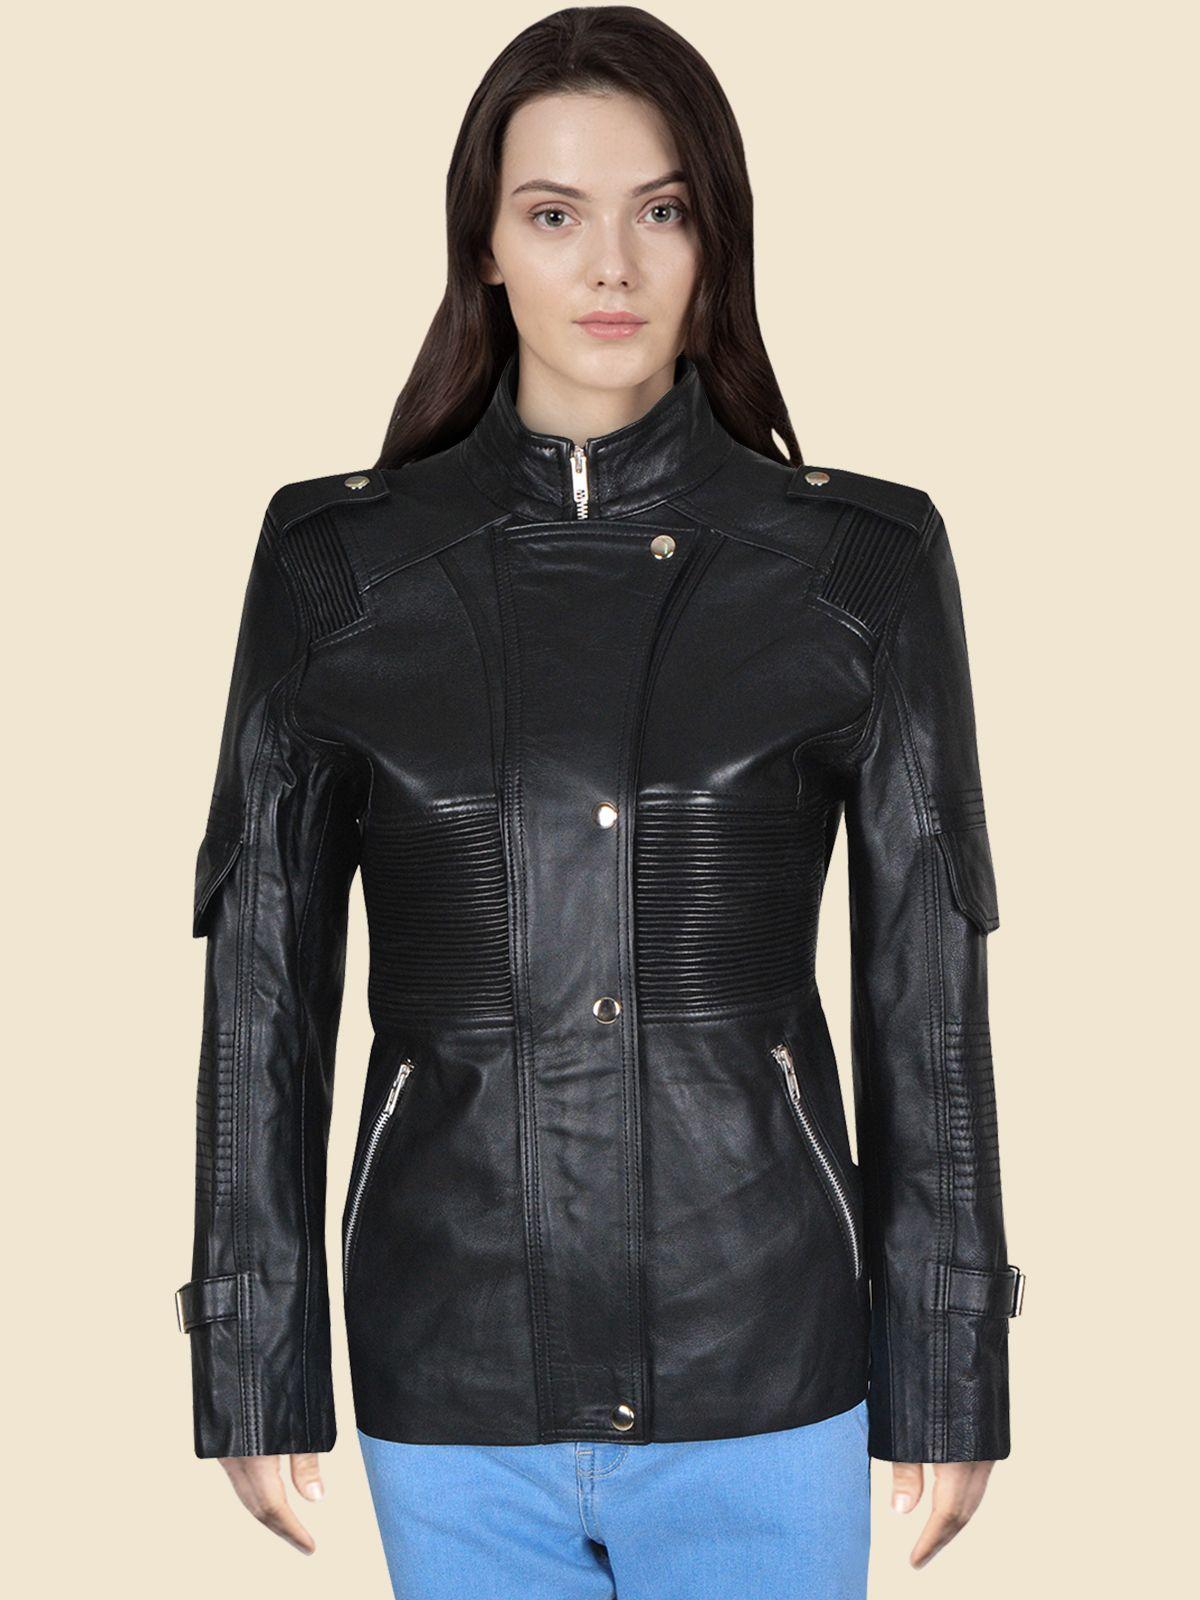 Black Stylish Genuine Leather Jacket For Women S Leather Jacket Jackets For Women Leather Jackets Women [ 1600 x 1200 Pixel ]